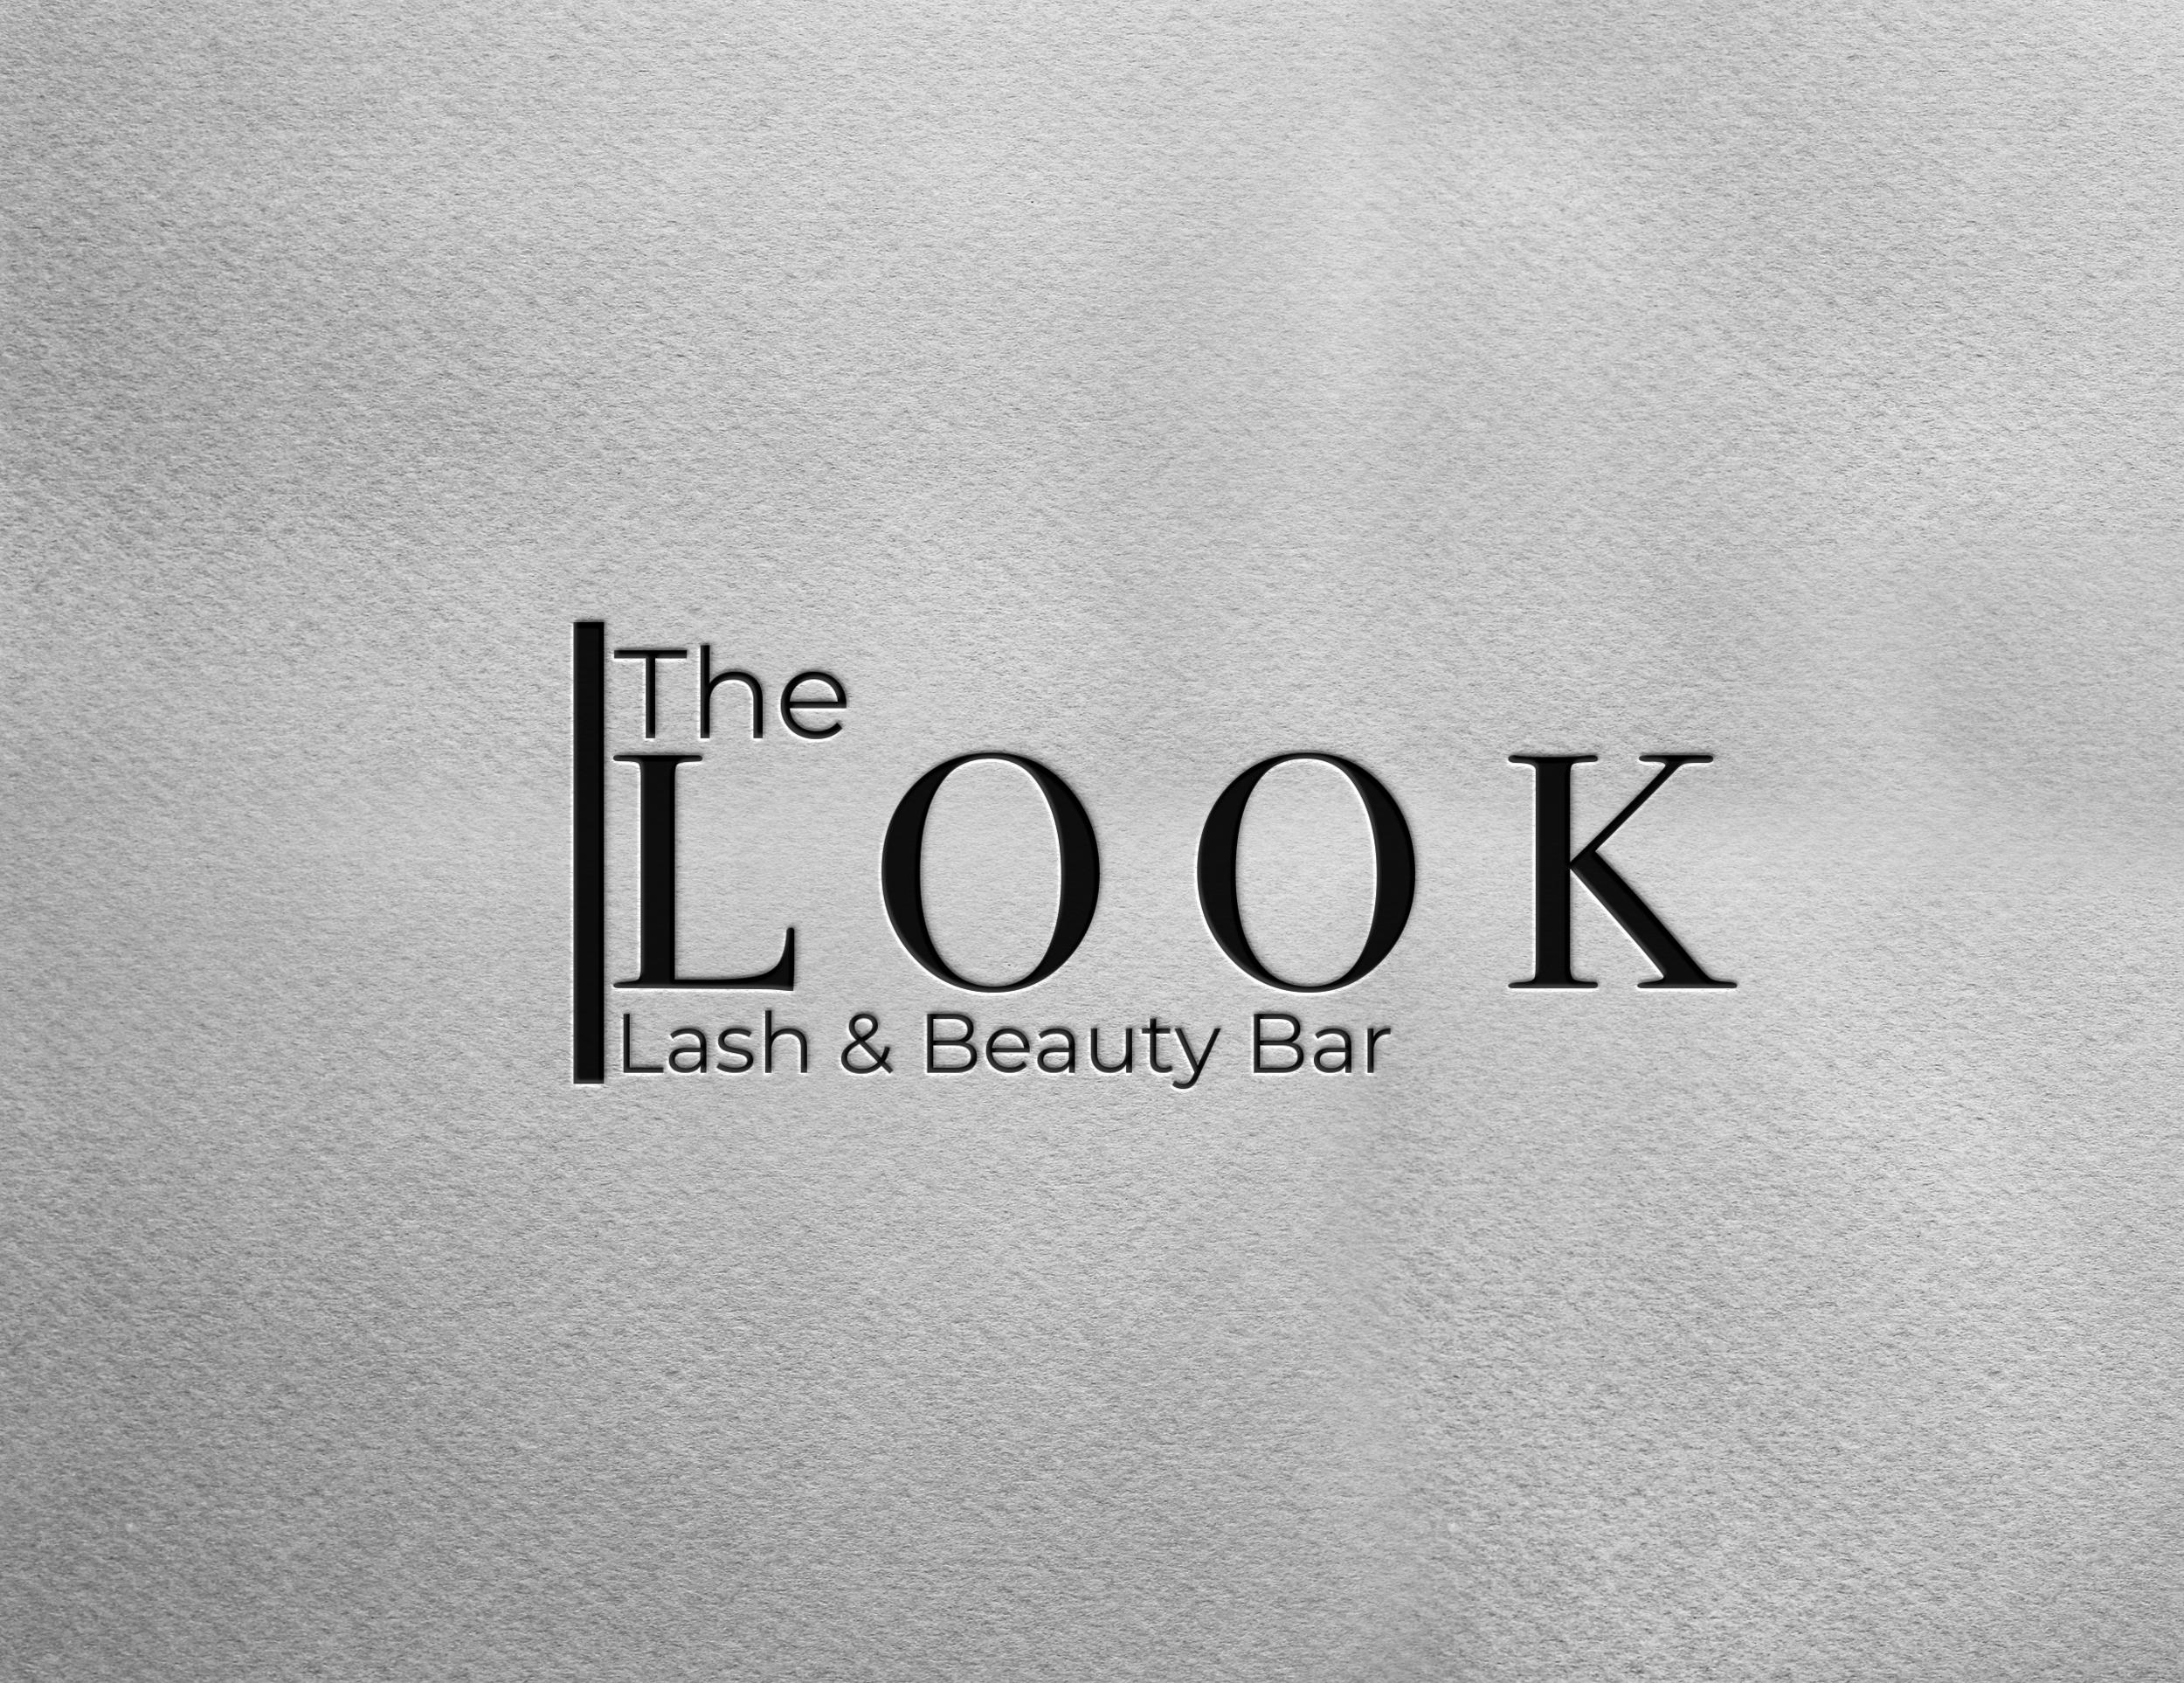 The Look Logo Mockup.png